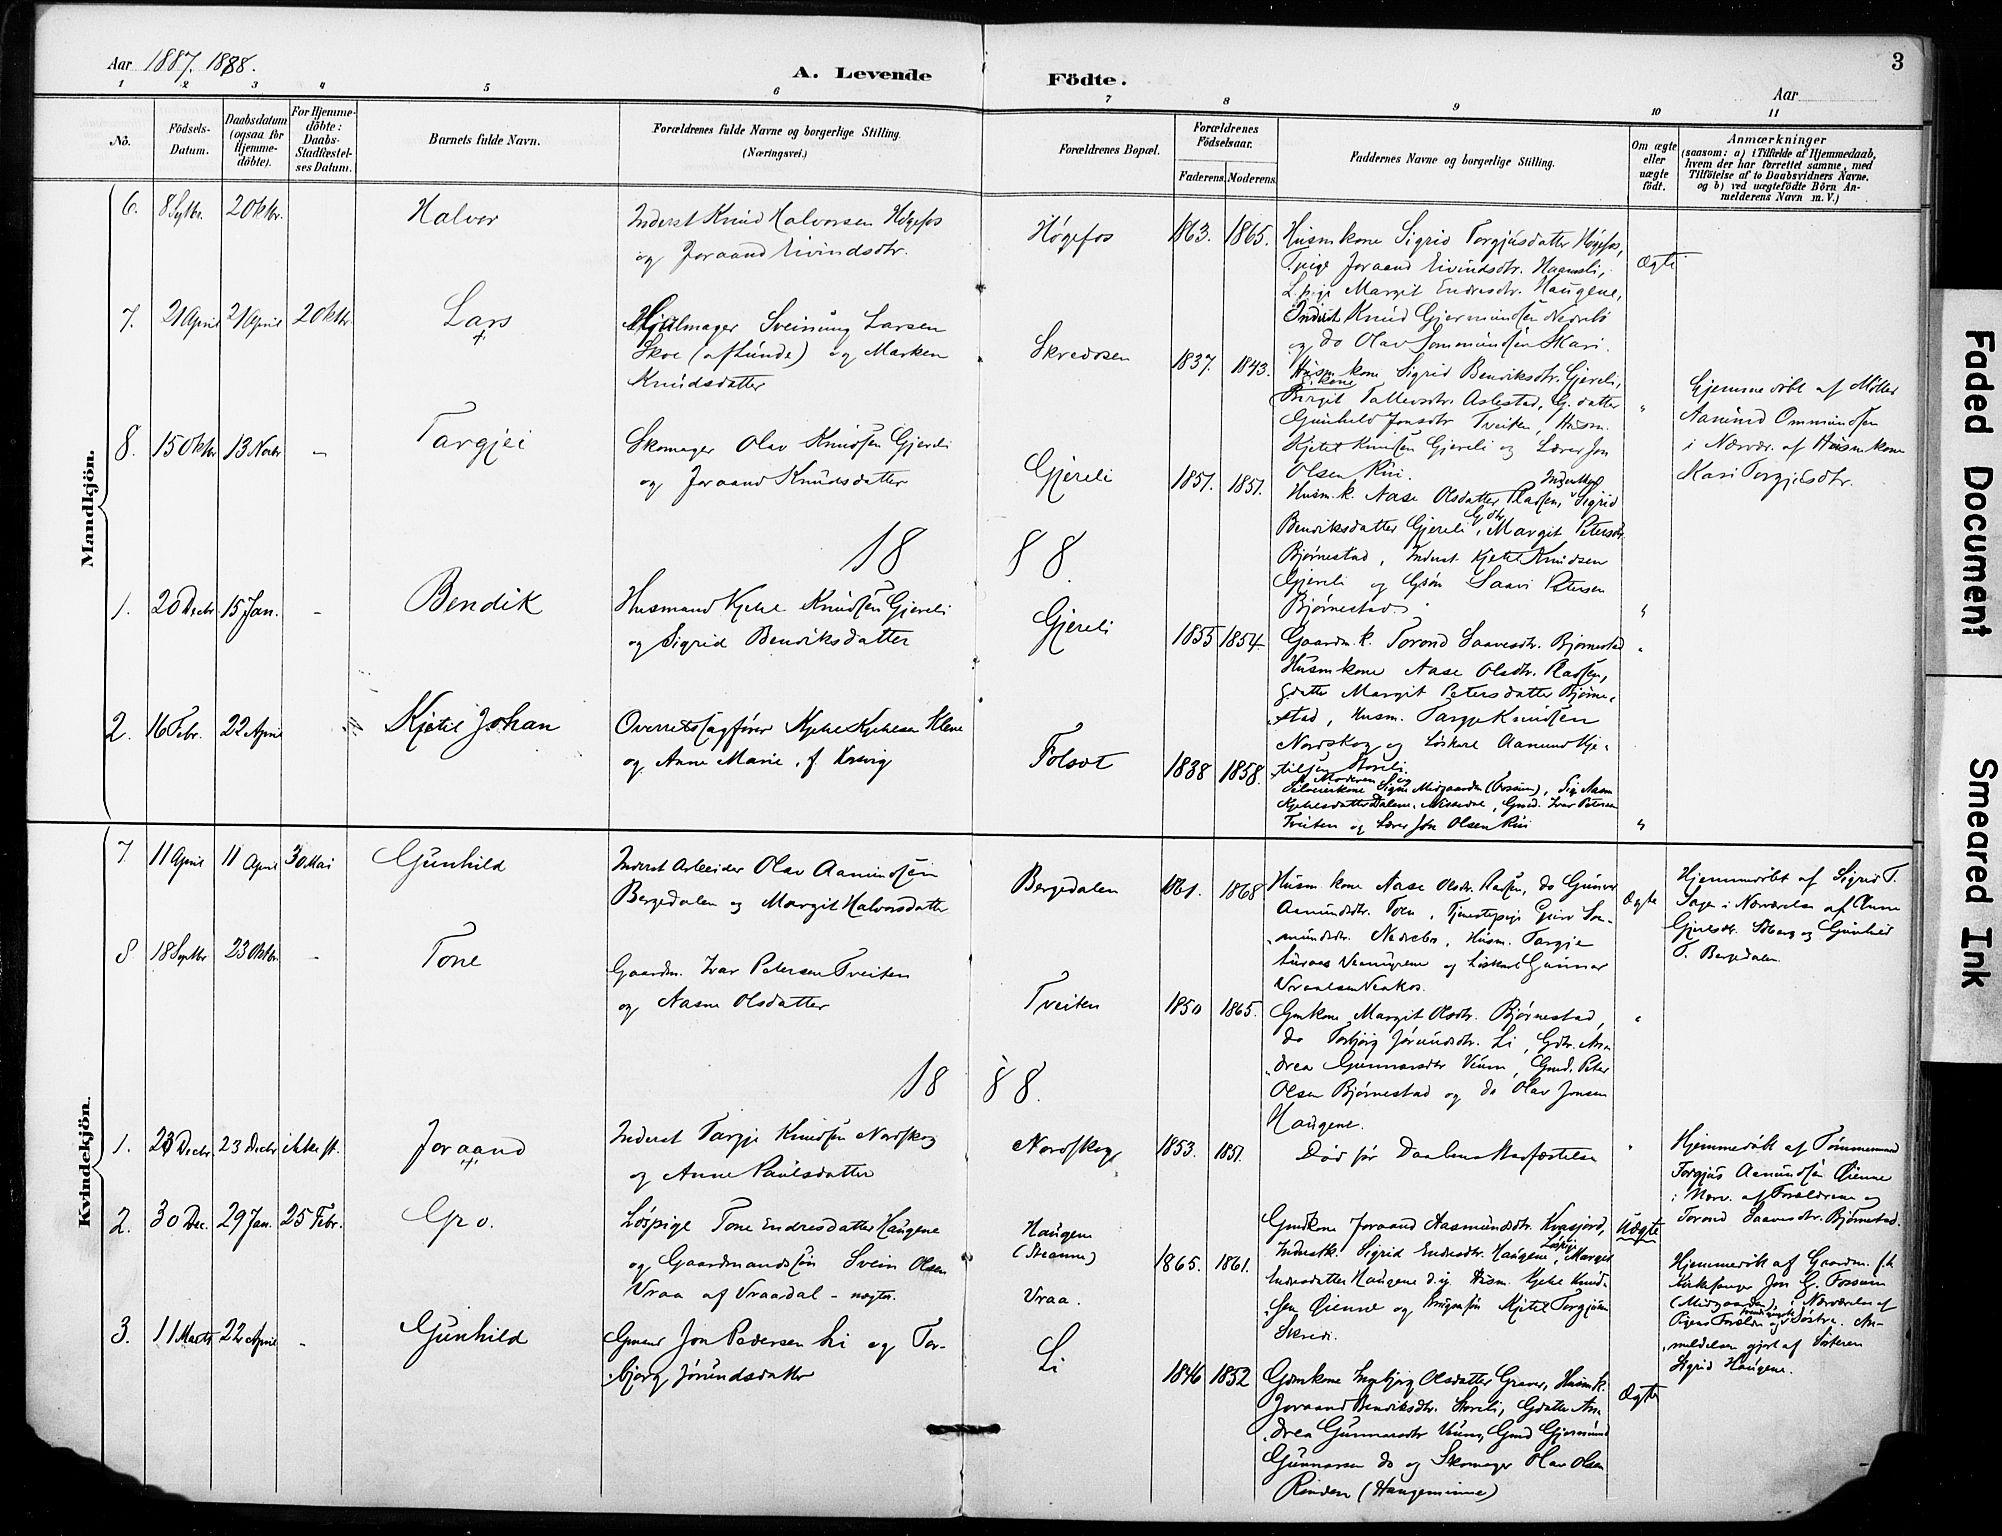 SAKO, Fyresdal kirkebøker, F/Fb/L0003: Ministerialbok nr. II 3, 1887-1903, s. 3